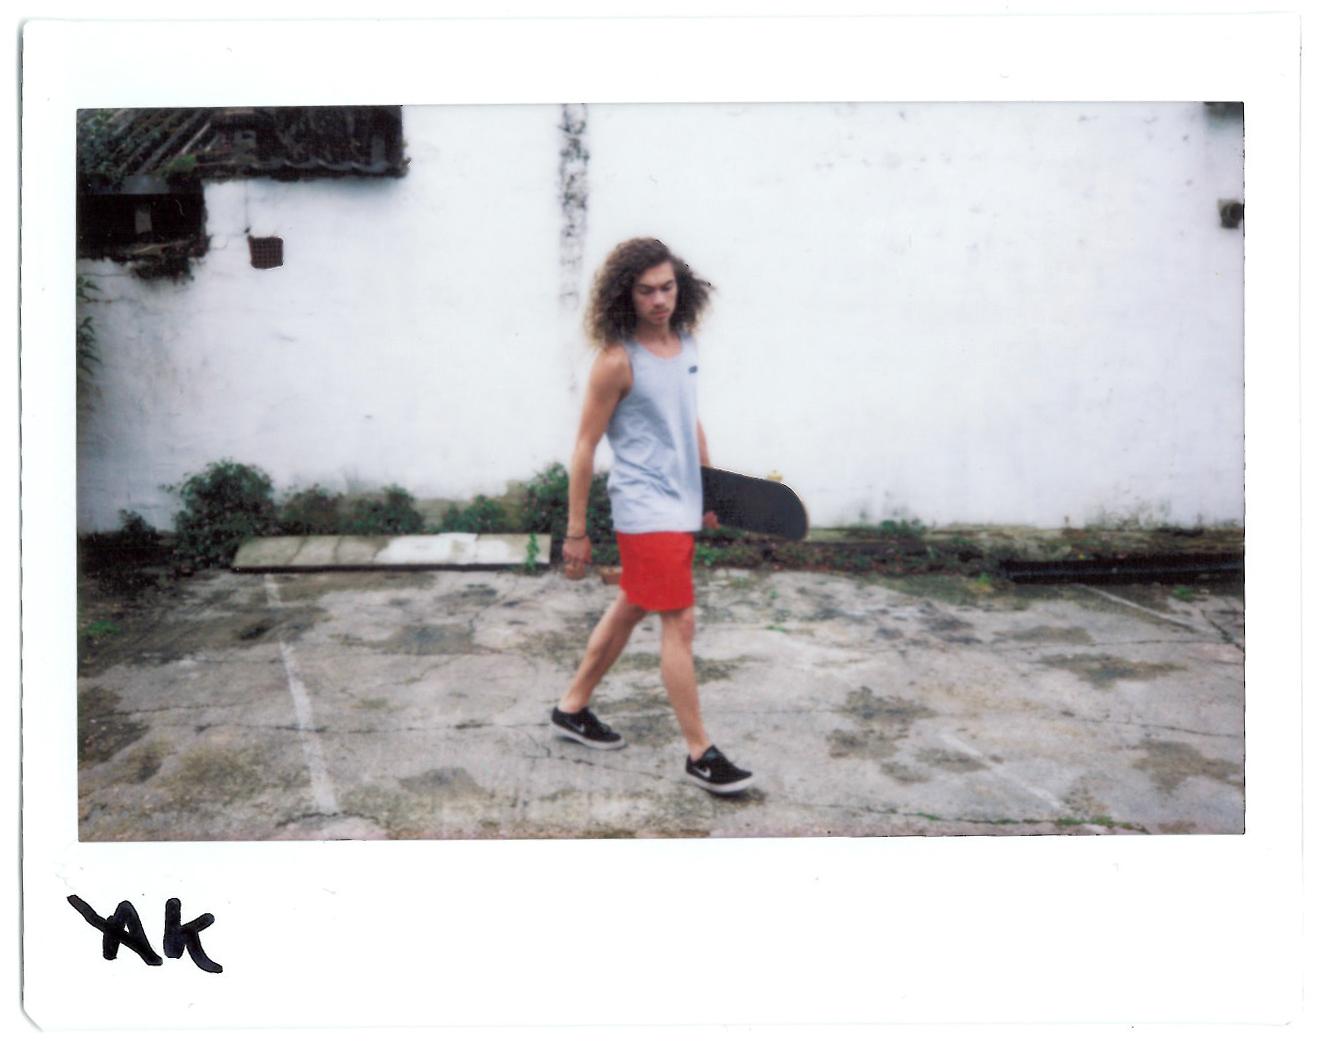 ALFIE_07